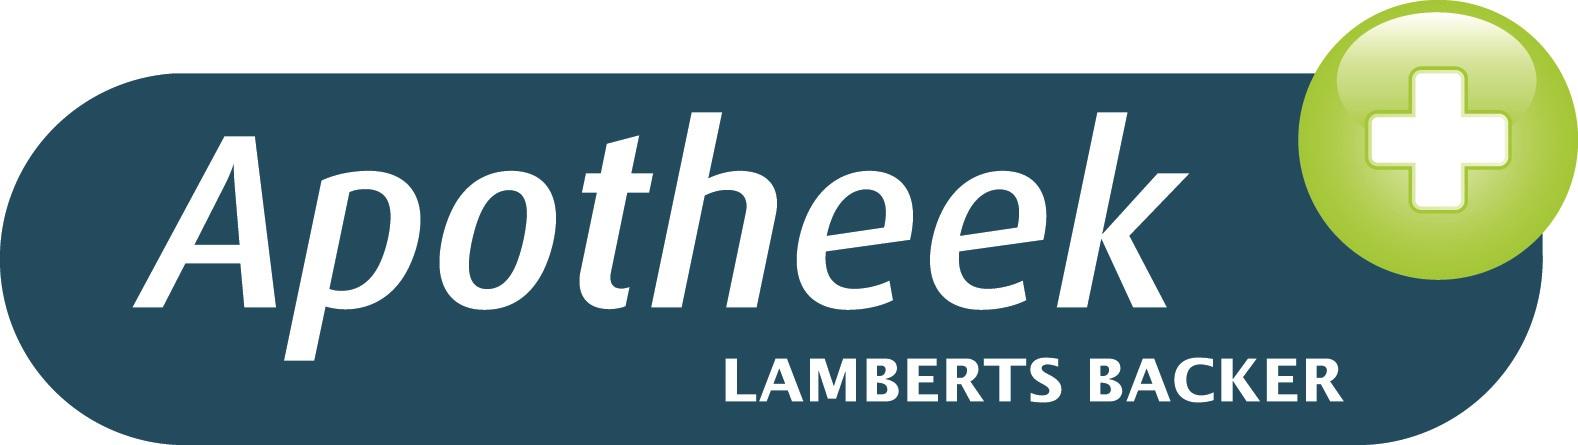 Startpagina Apotheek Lamberts Backer